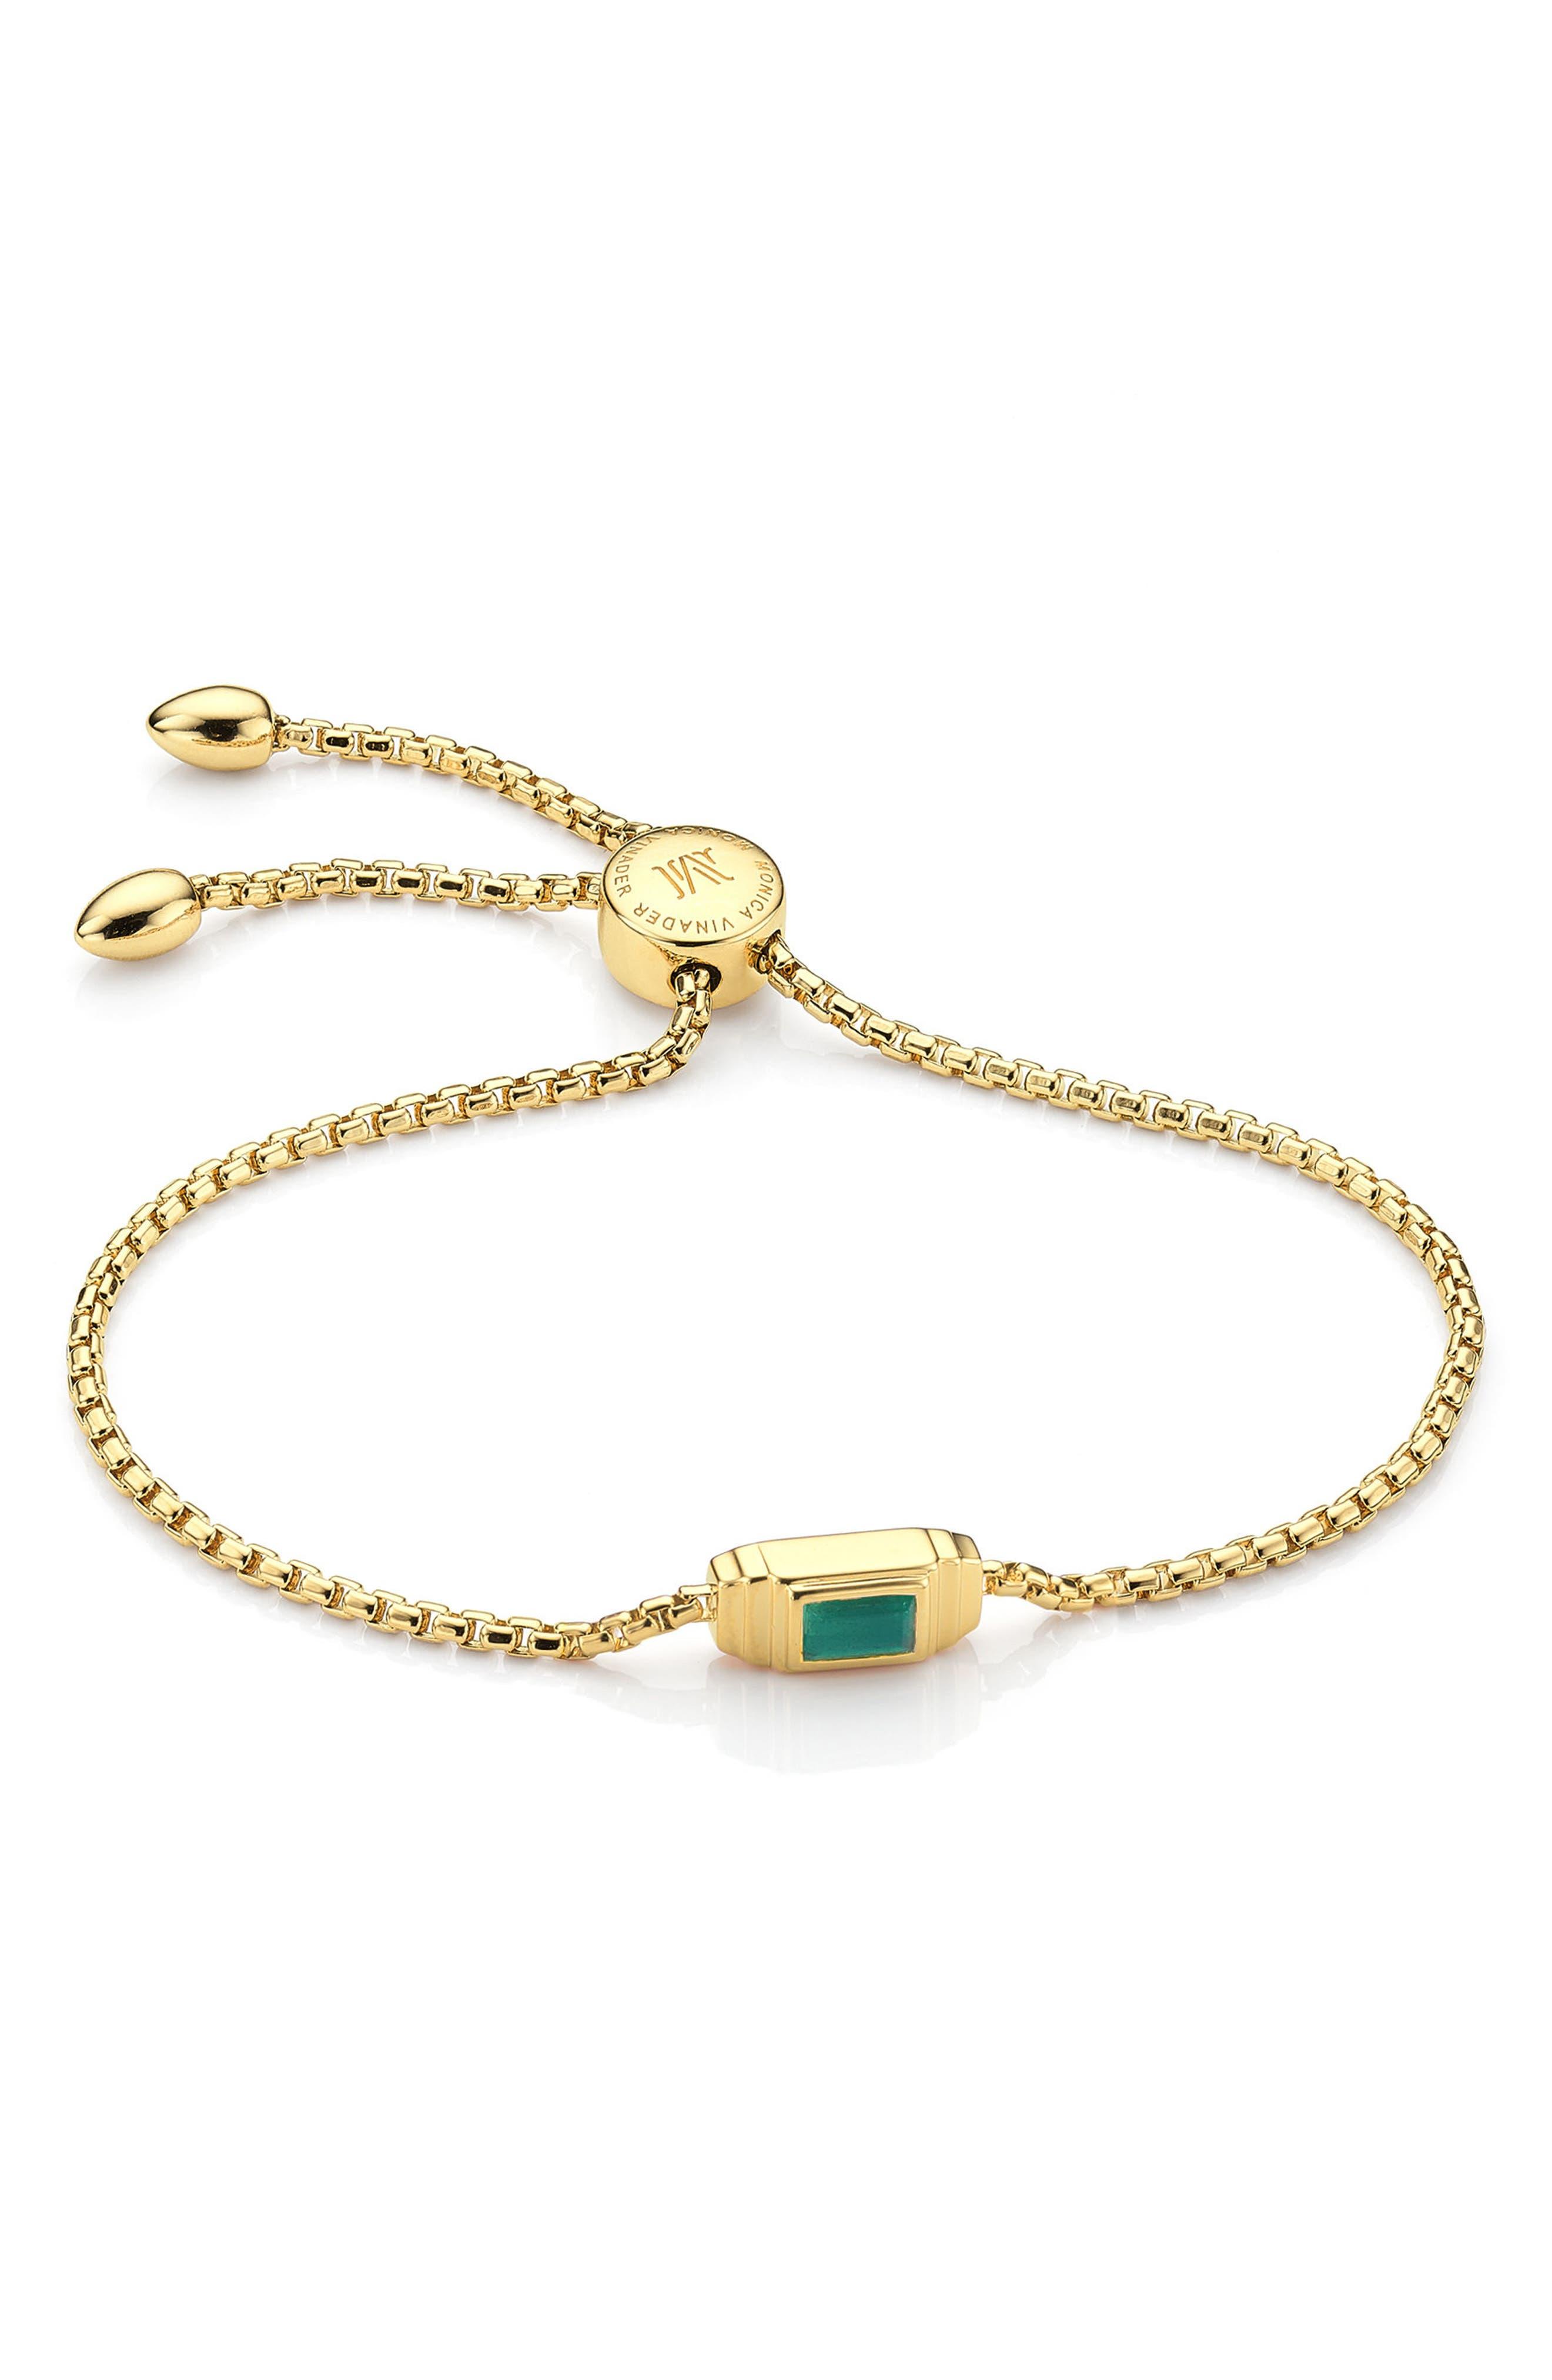 Monica Vinader Baja Deco Friendship Bracelet